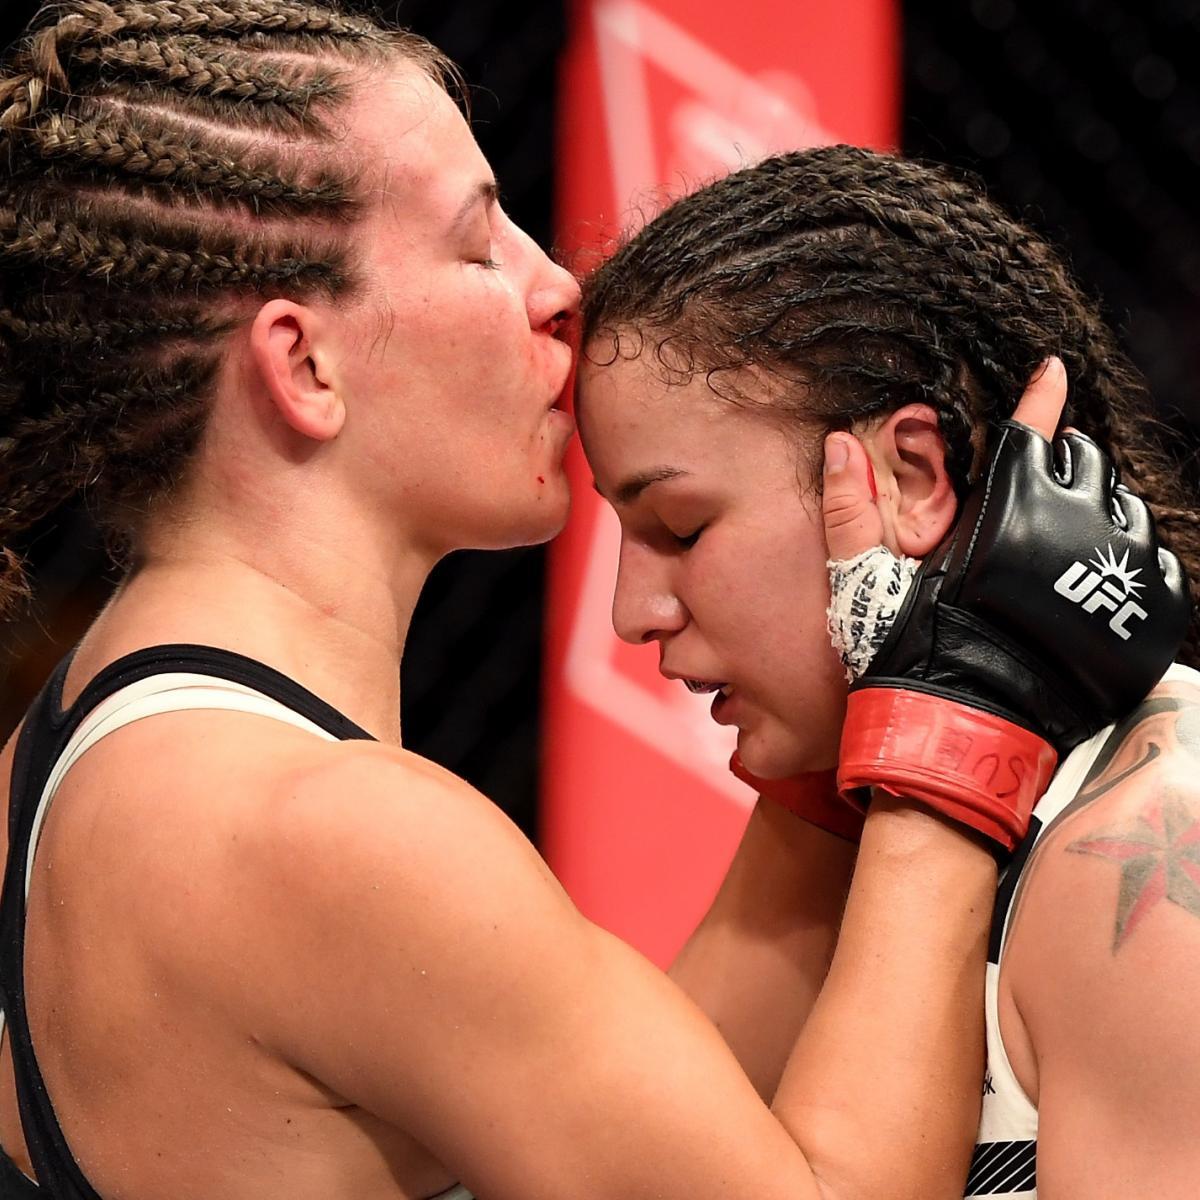 UFC 200 Results: Winners, Scorecards from Tate vs. Nunes